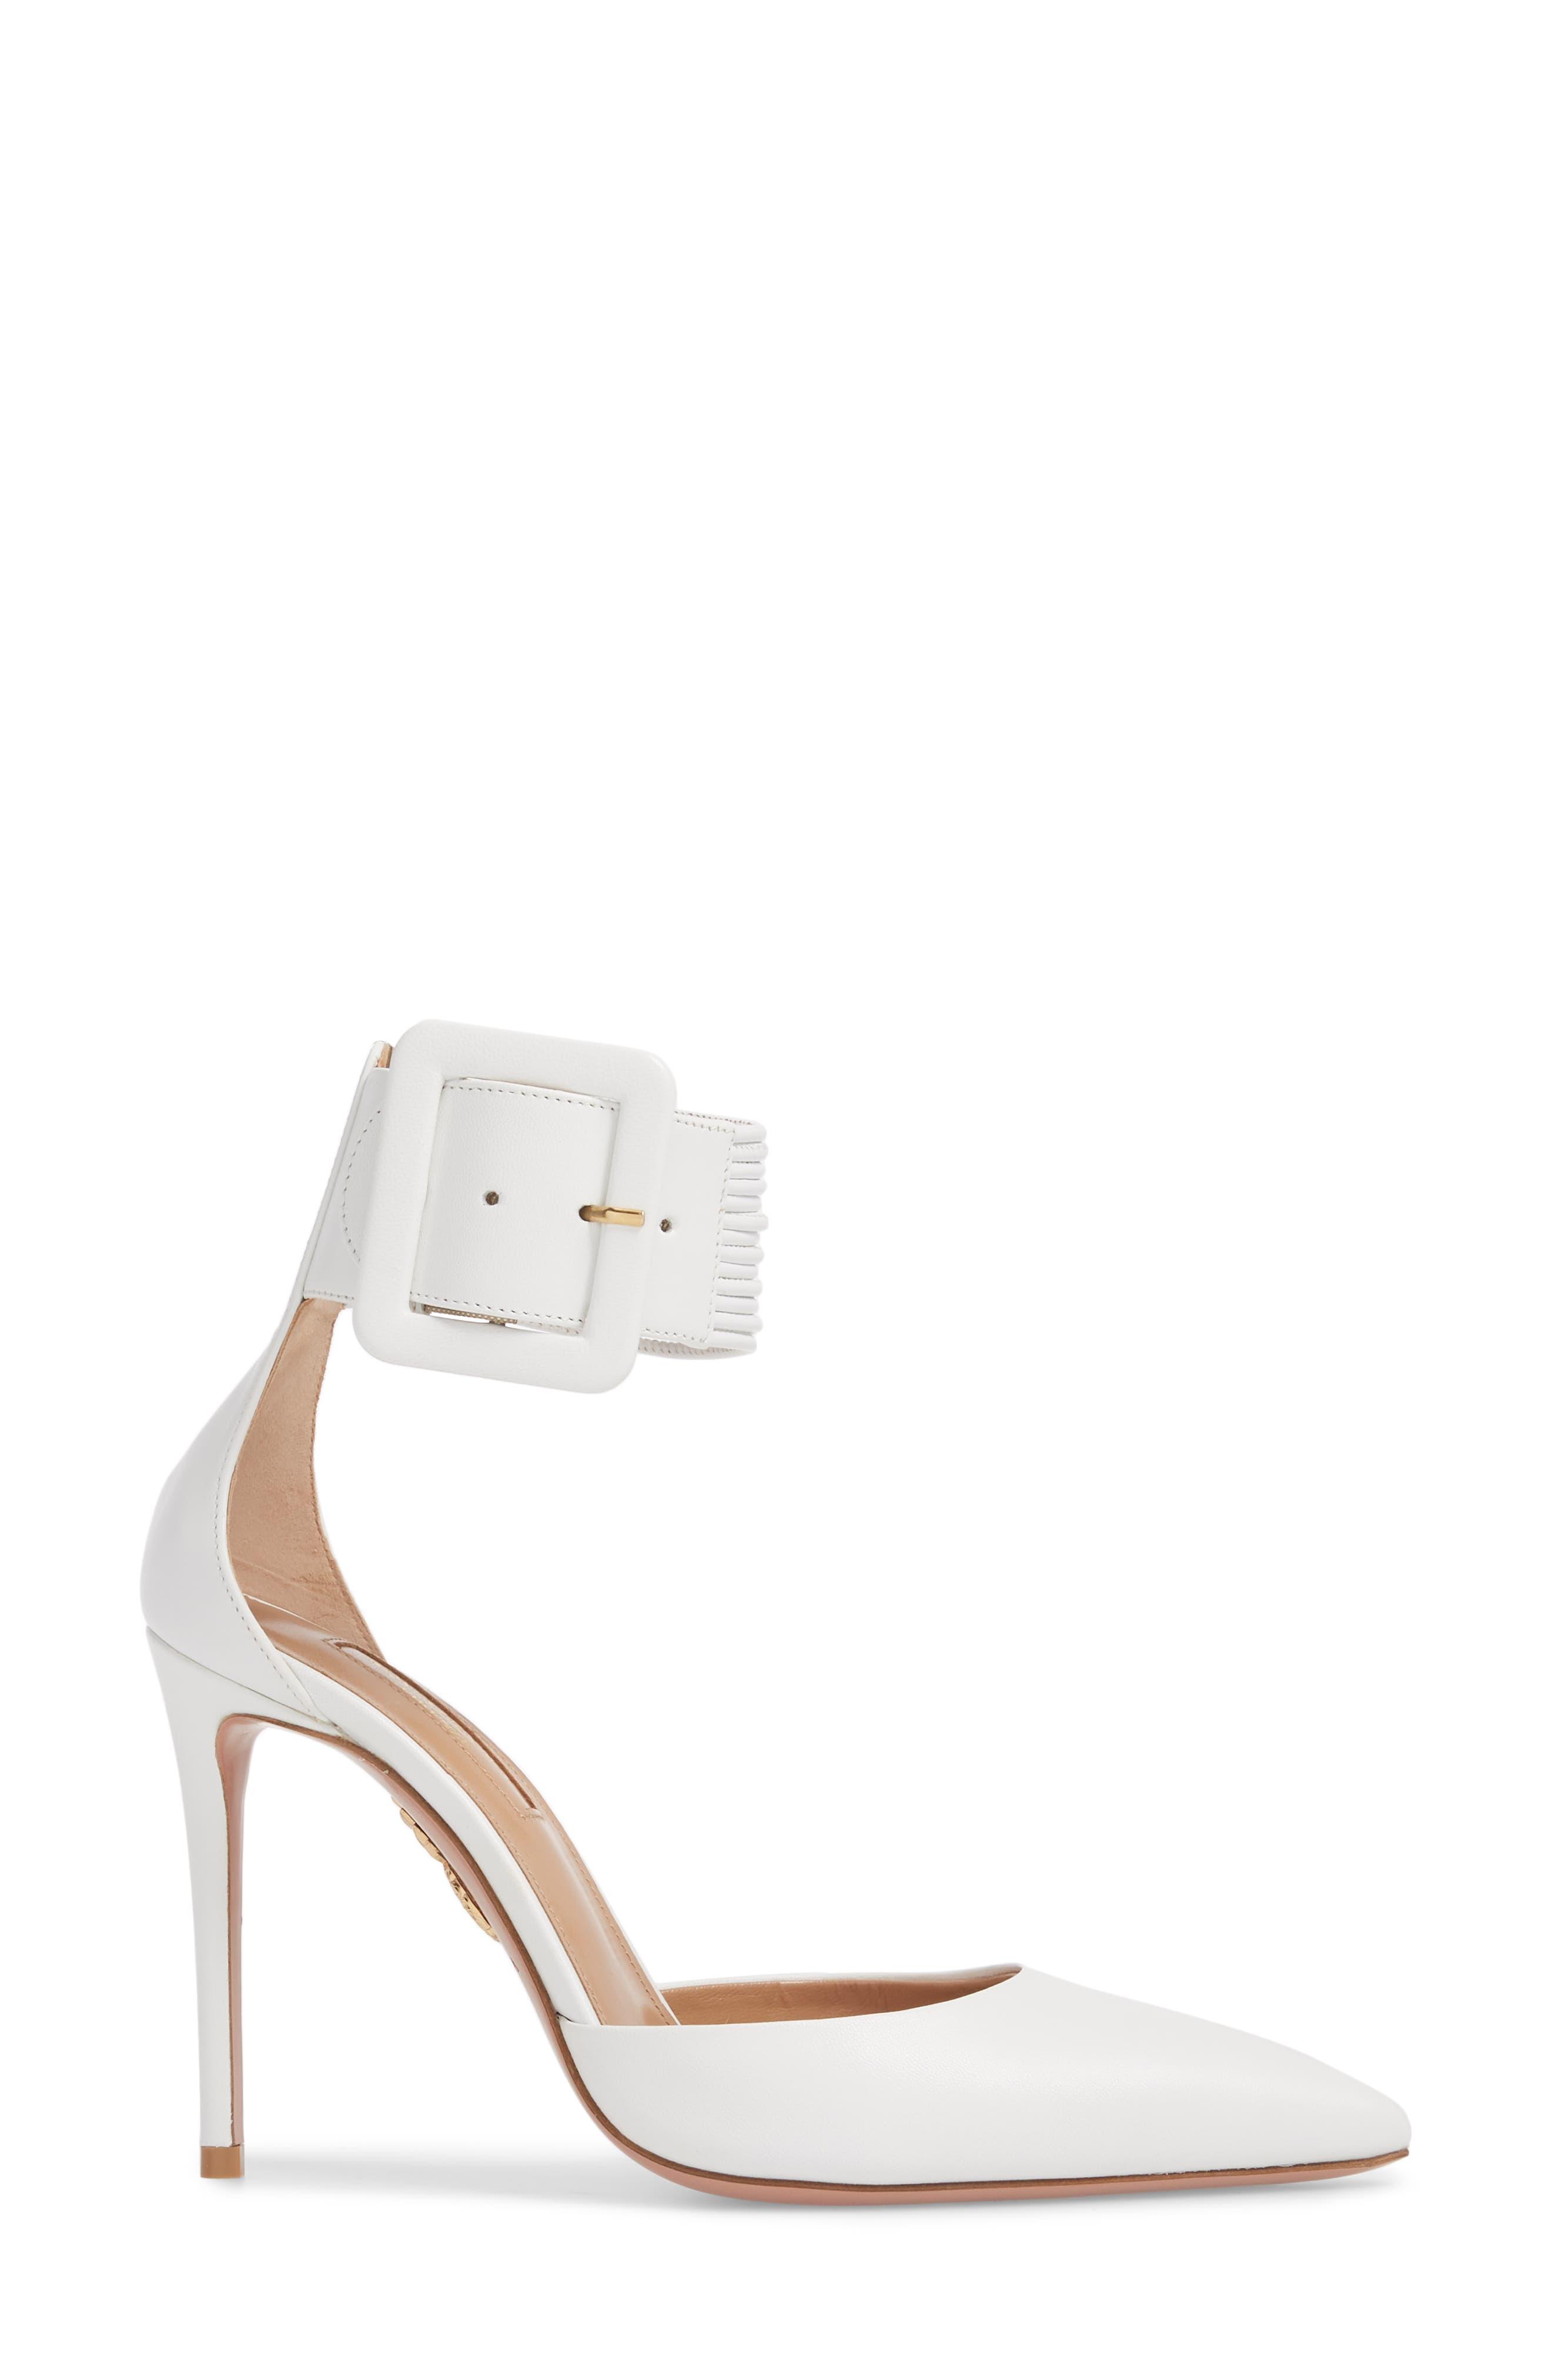 Alternate Image 3  - Aquazzura Casablanca Ankle Cuff Pump (Women)